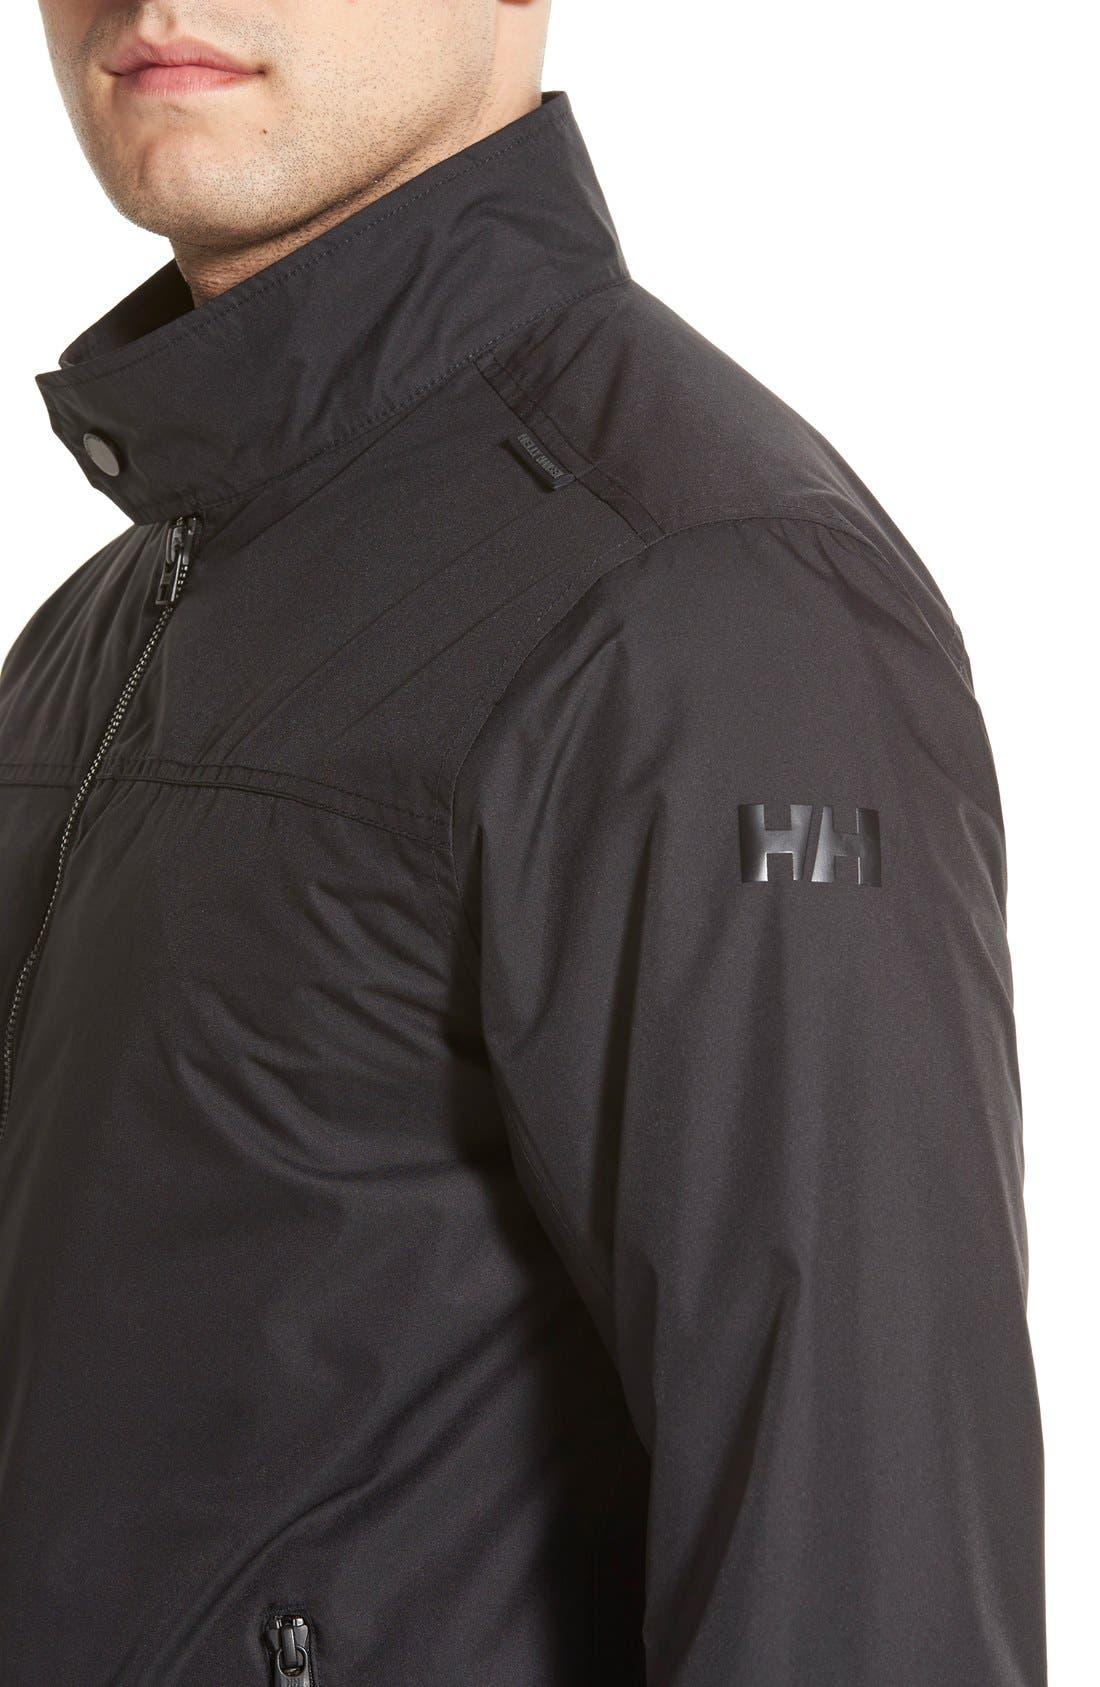 HELLY HANSEN,                             'Derry' Waterproof Jacket,                             Alternate thumbnail 2, color,                             009